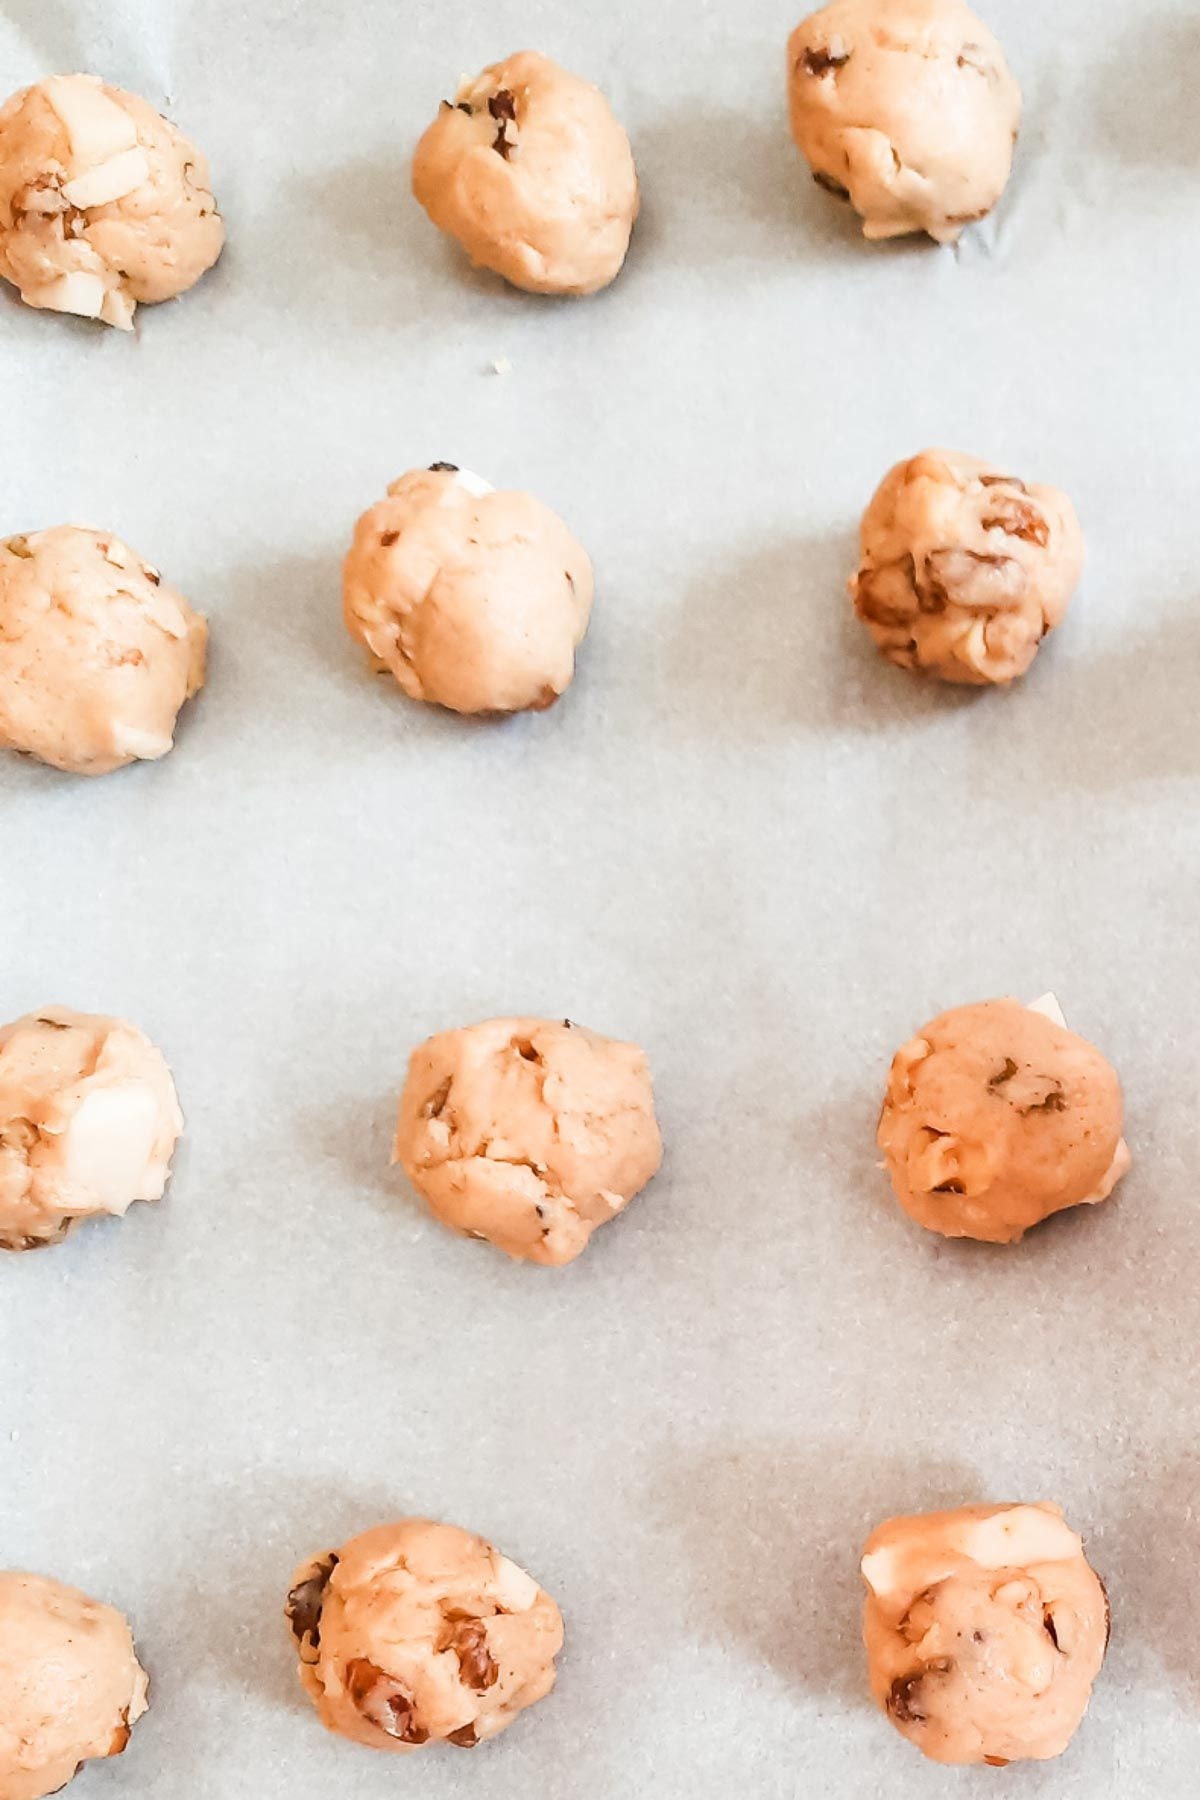 Apple cookie dough scoops on parchment paper.